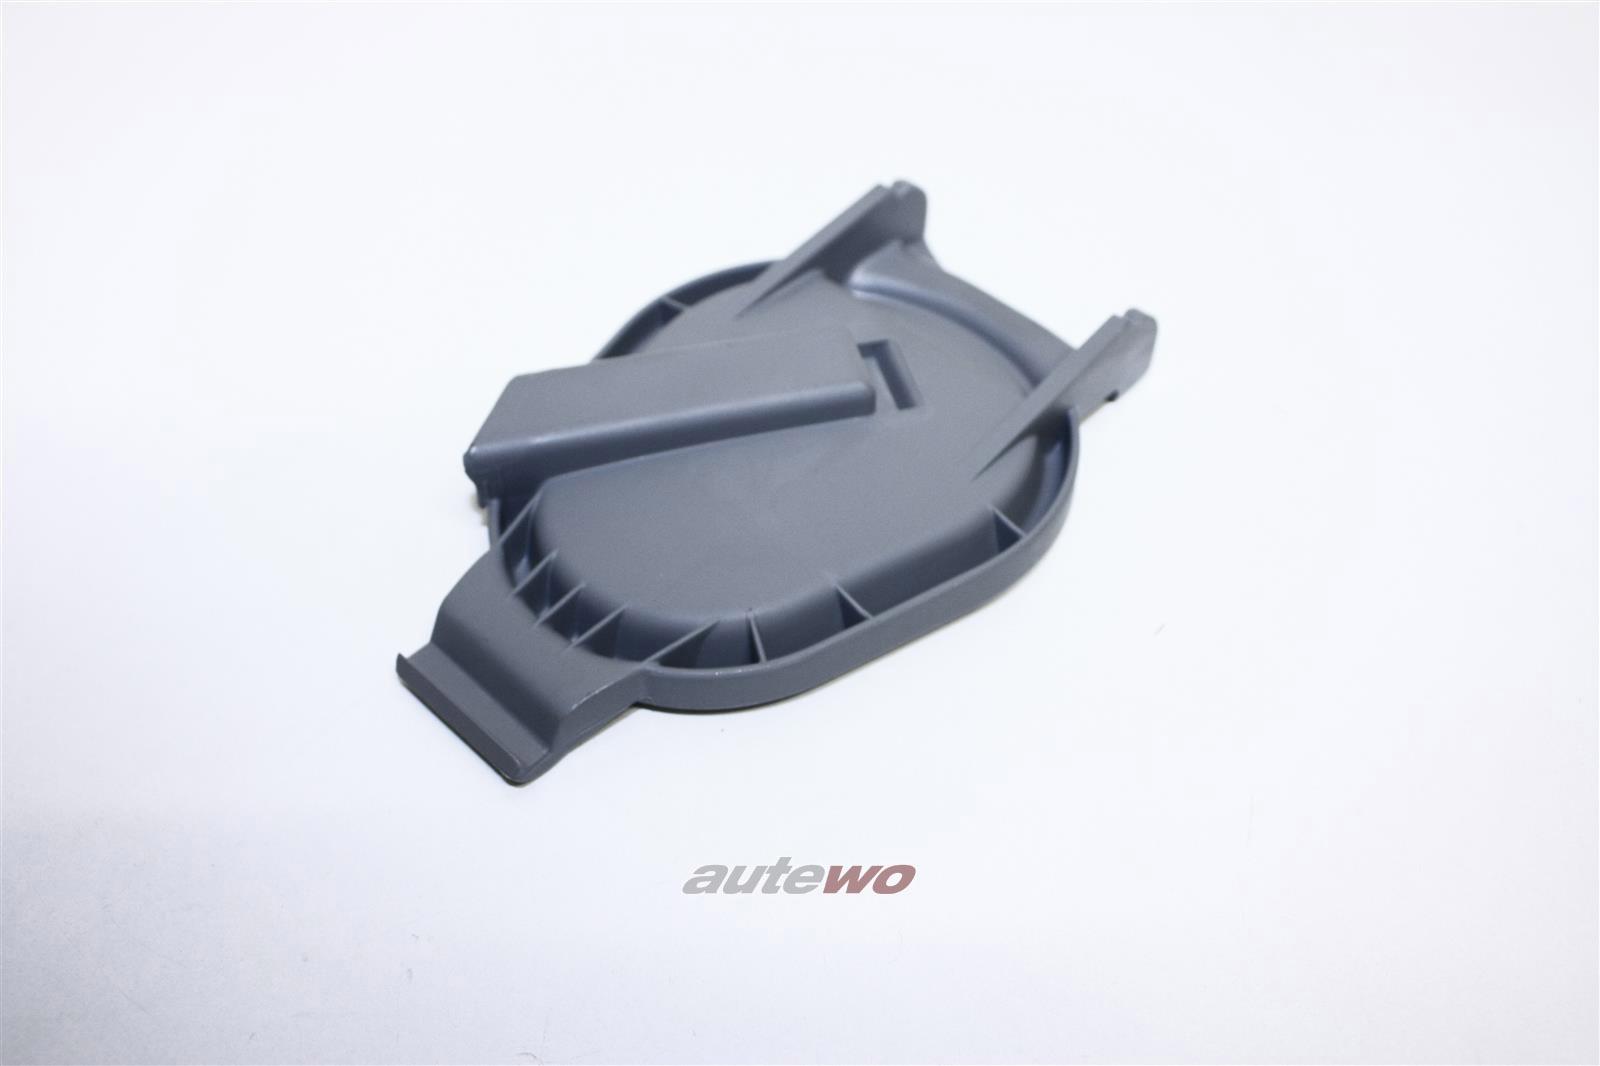 NEU&ORIGINAL Audi 200 Typ 44 Schutzkappe Scheinwerfer H3 447941159A